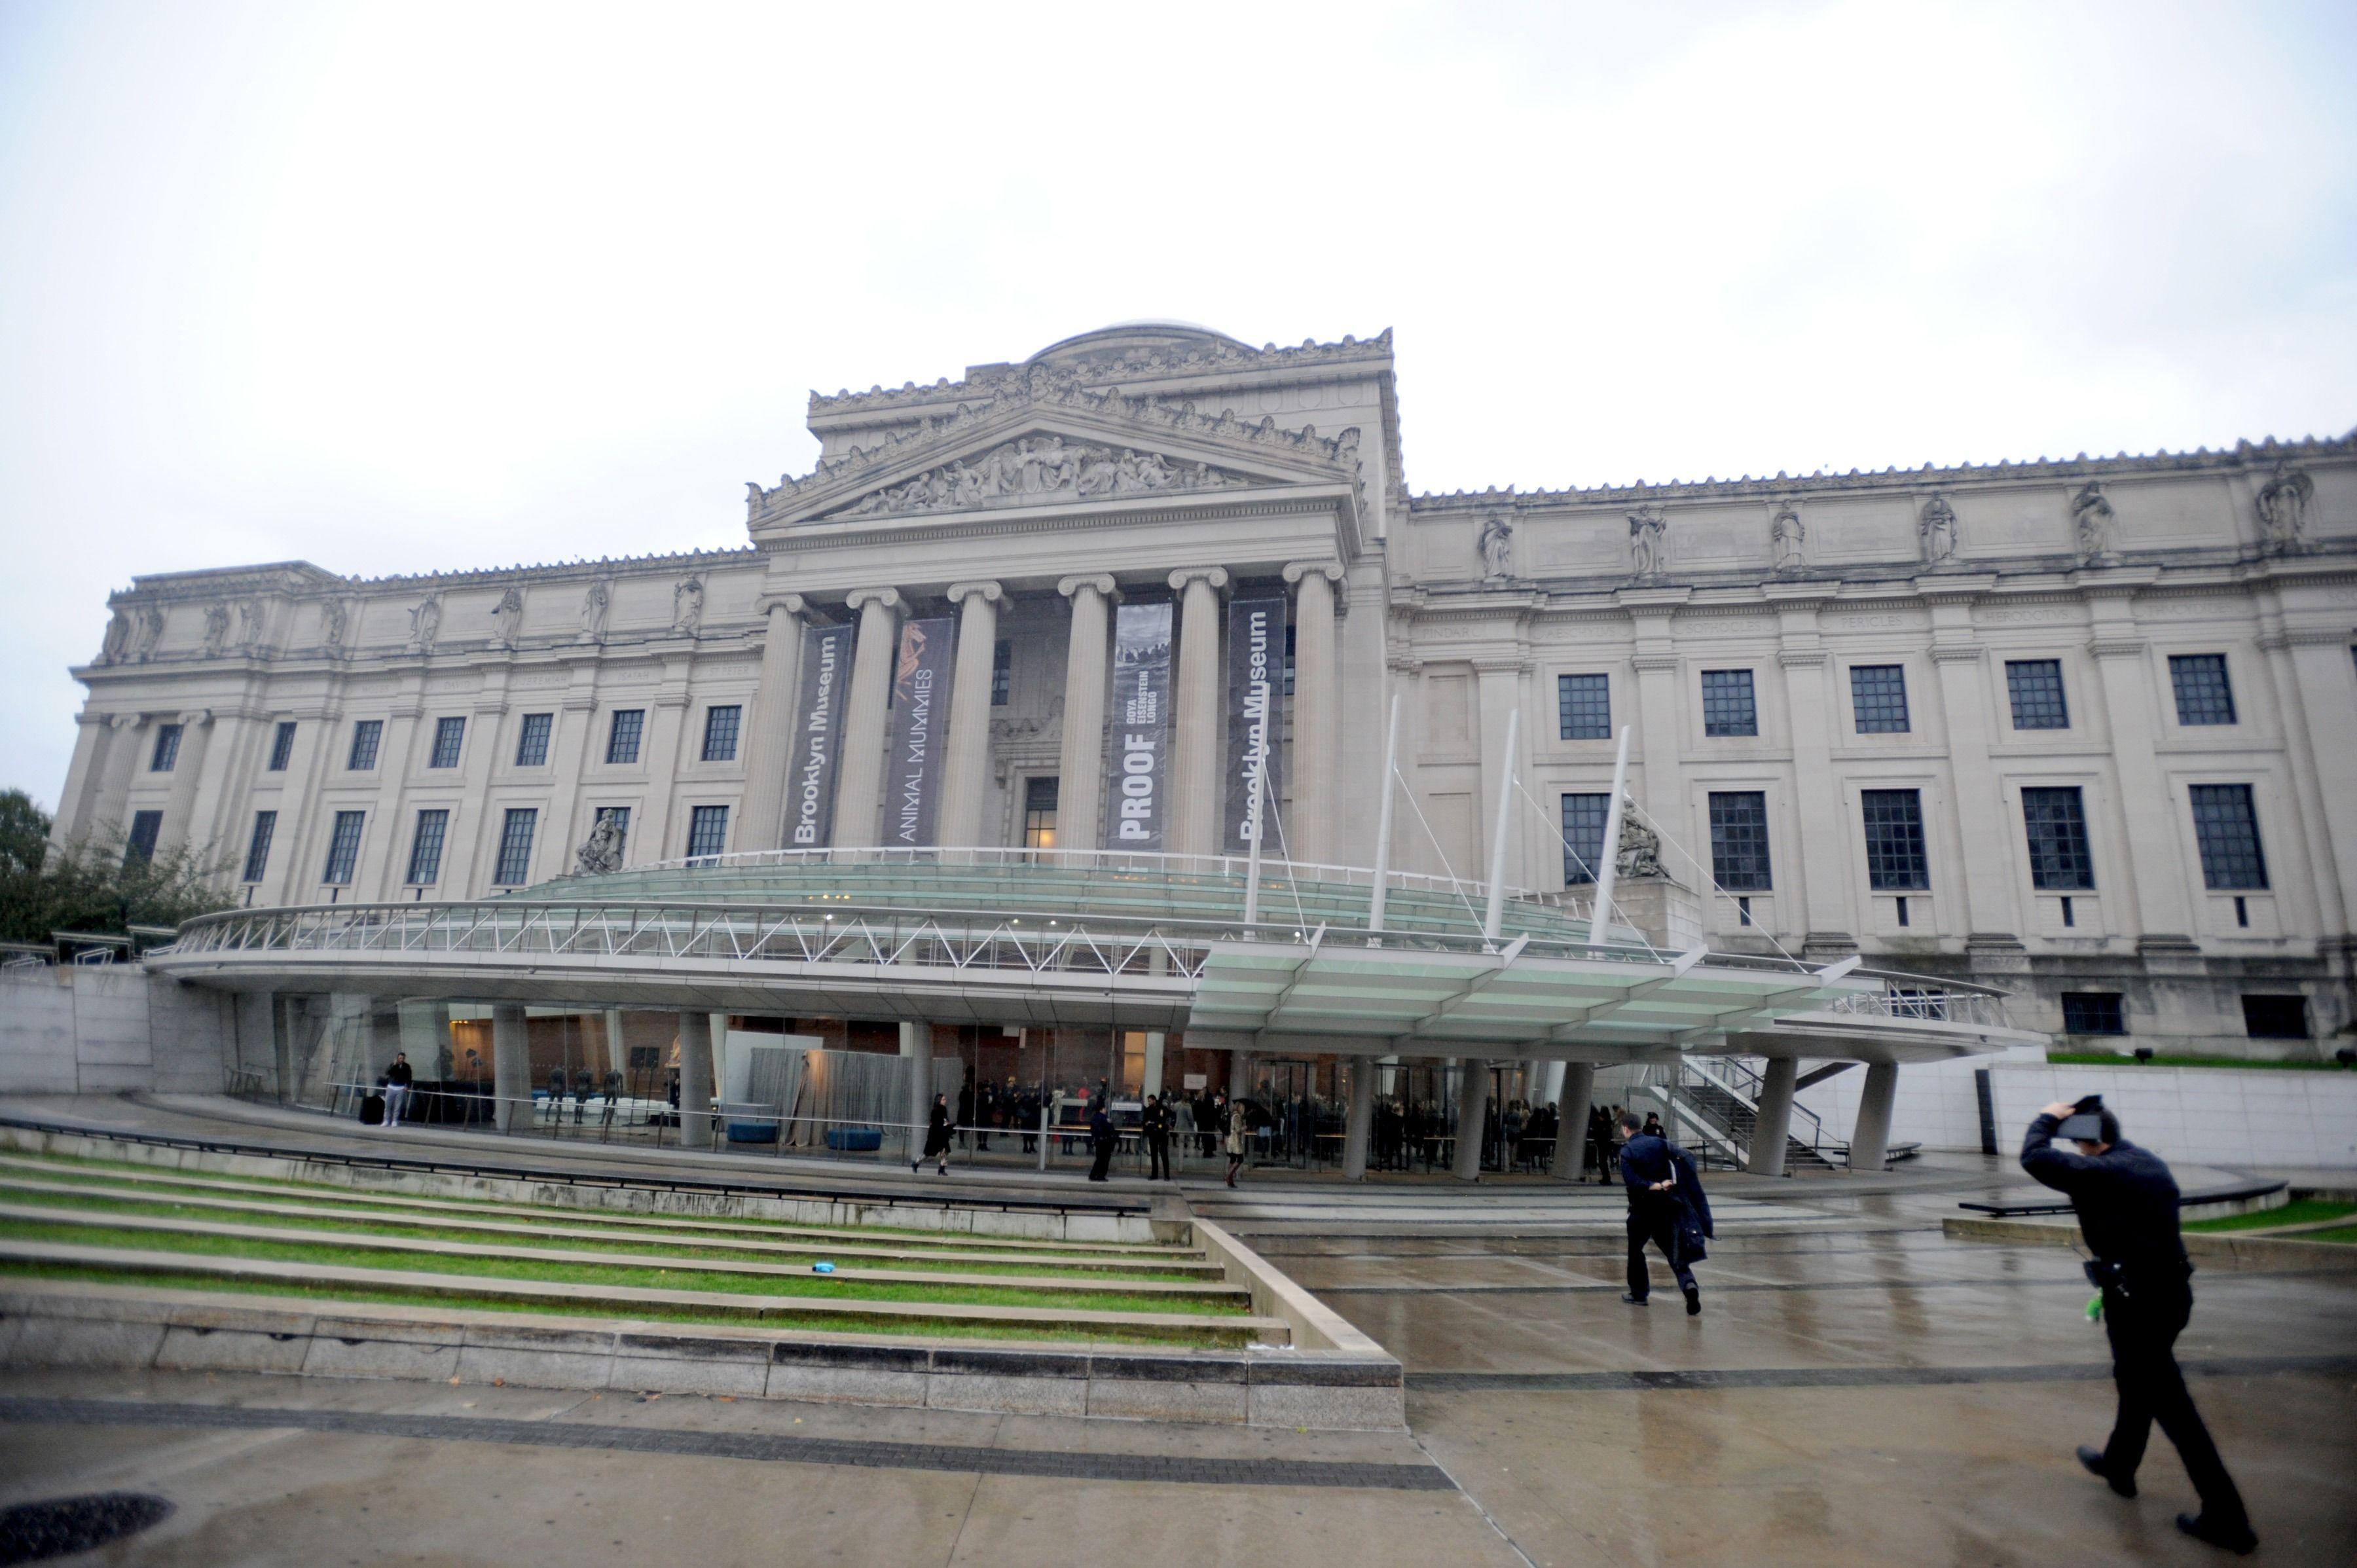 Robert S. Rubin, Who Spearheaded The Brooklyn Museum's Battle Against Rudy Giuliani, Dies at 86